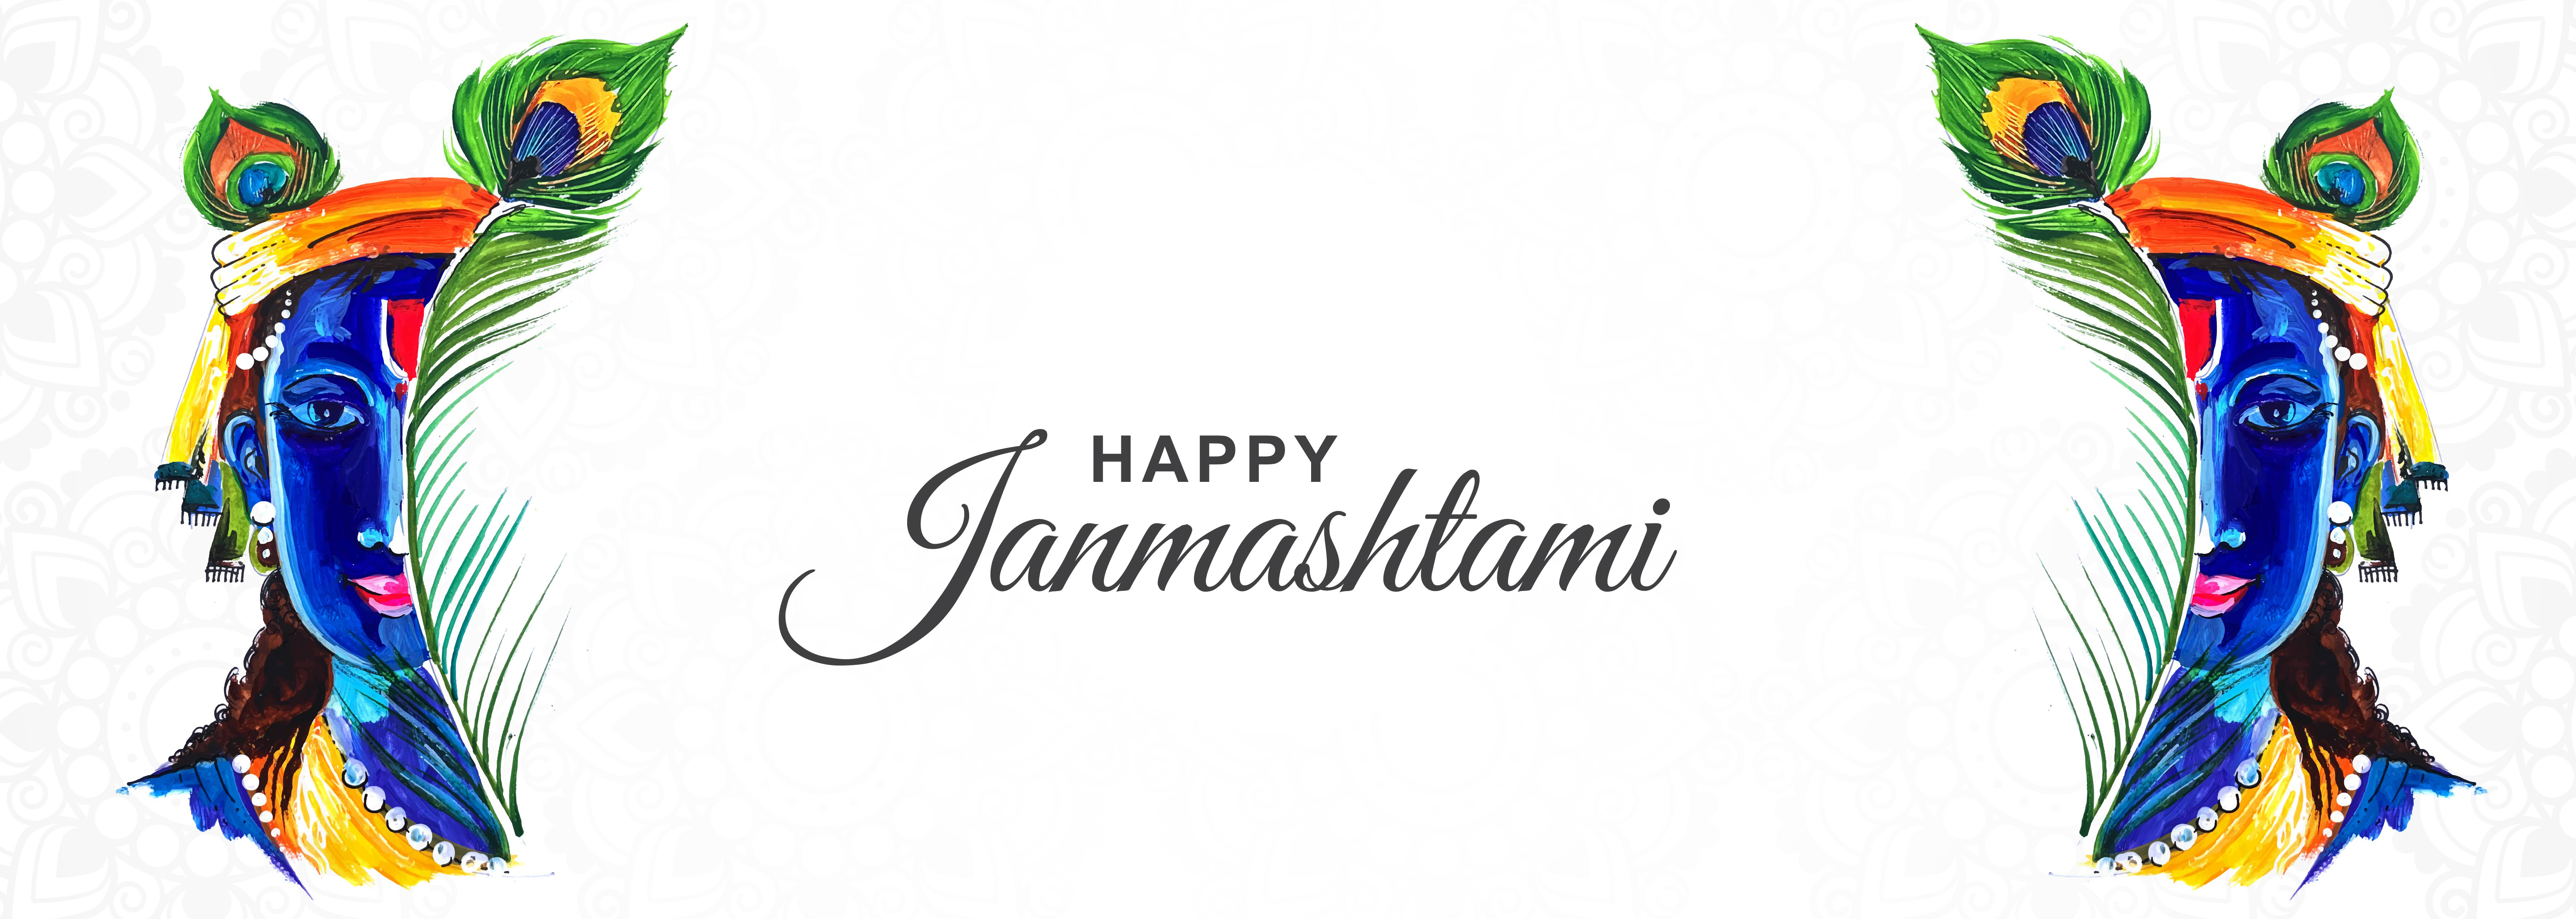 feliz krishna janmashtami media cara festival banner